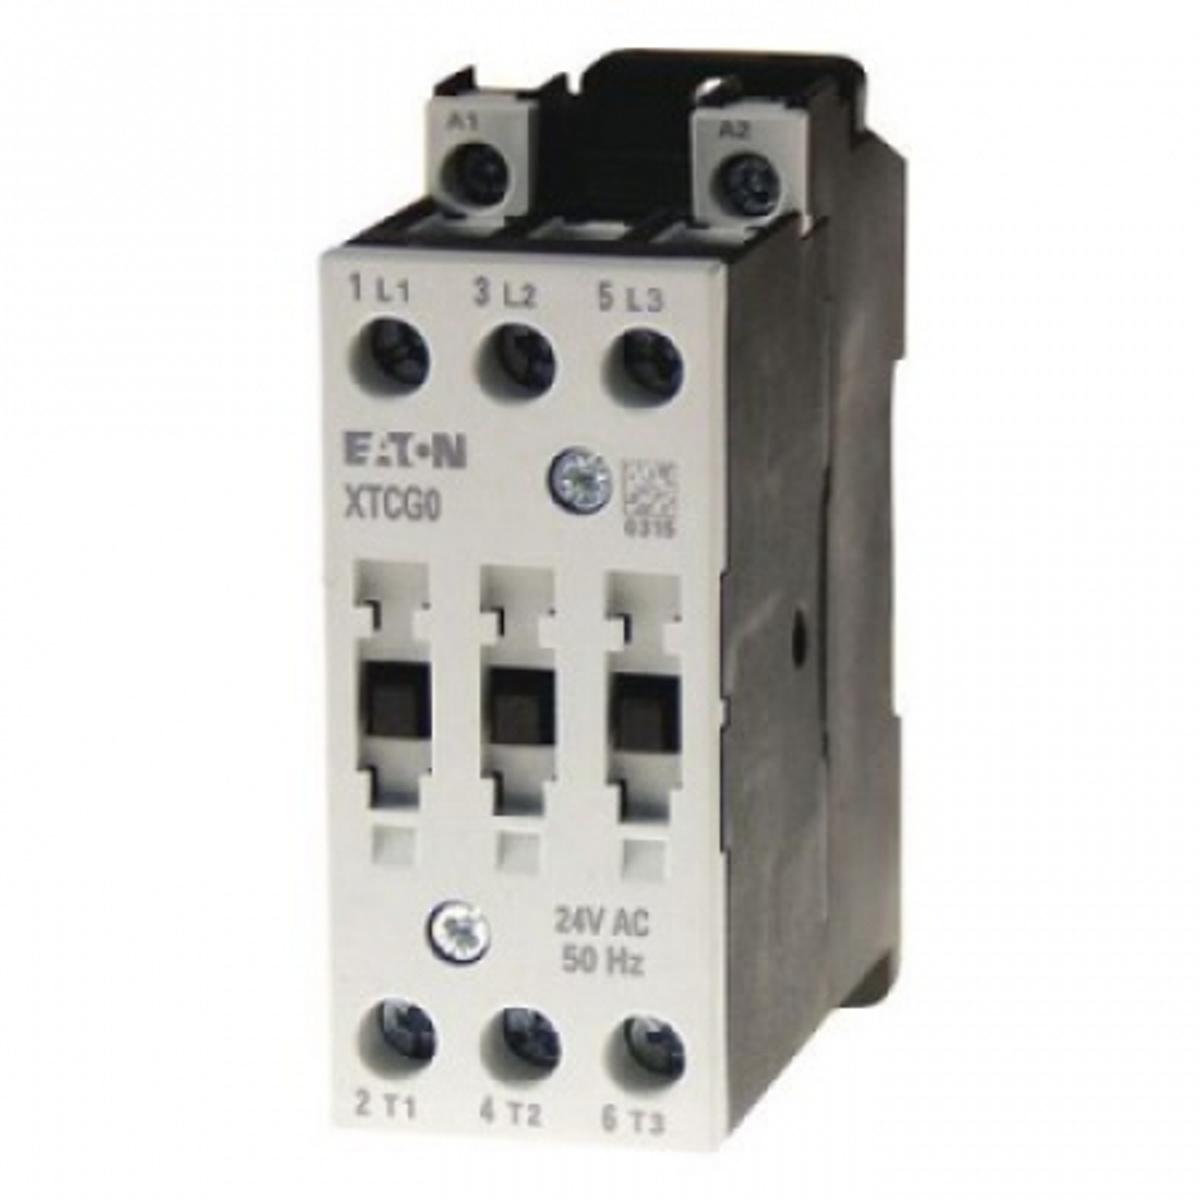 CONTATOR 3P 25A  24VDC SEM AUXILIAR XTCG025C00B0 EATON